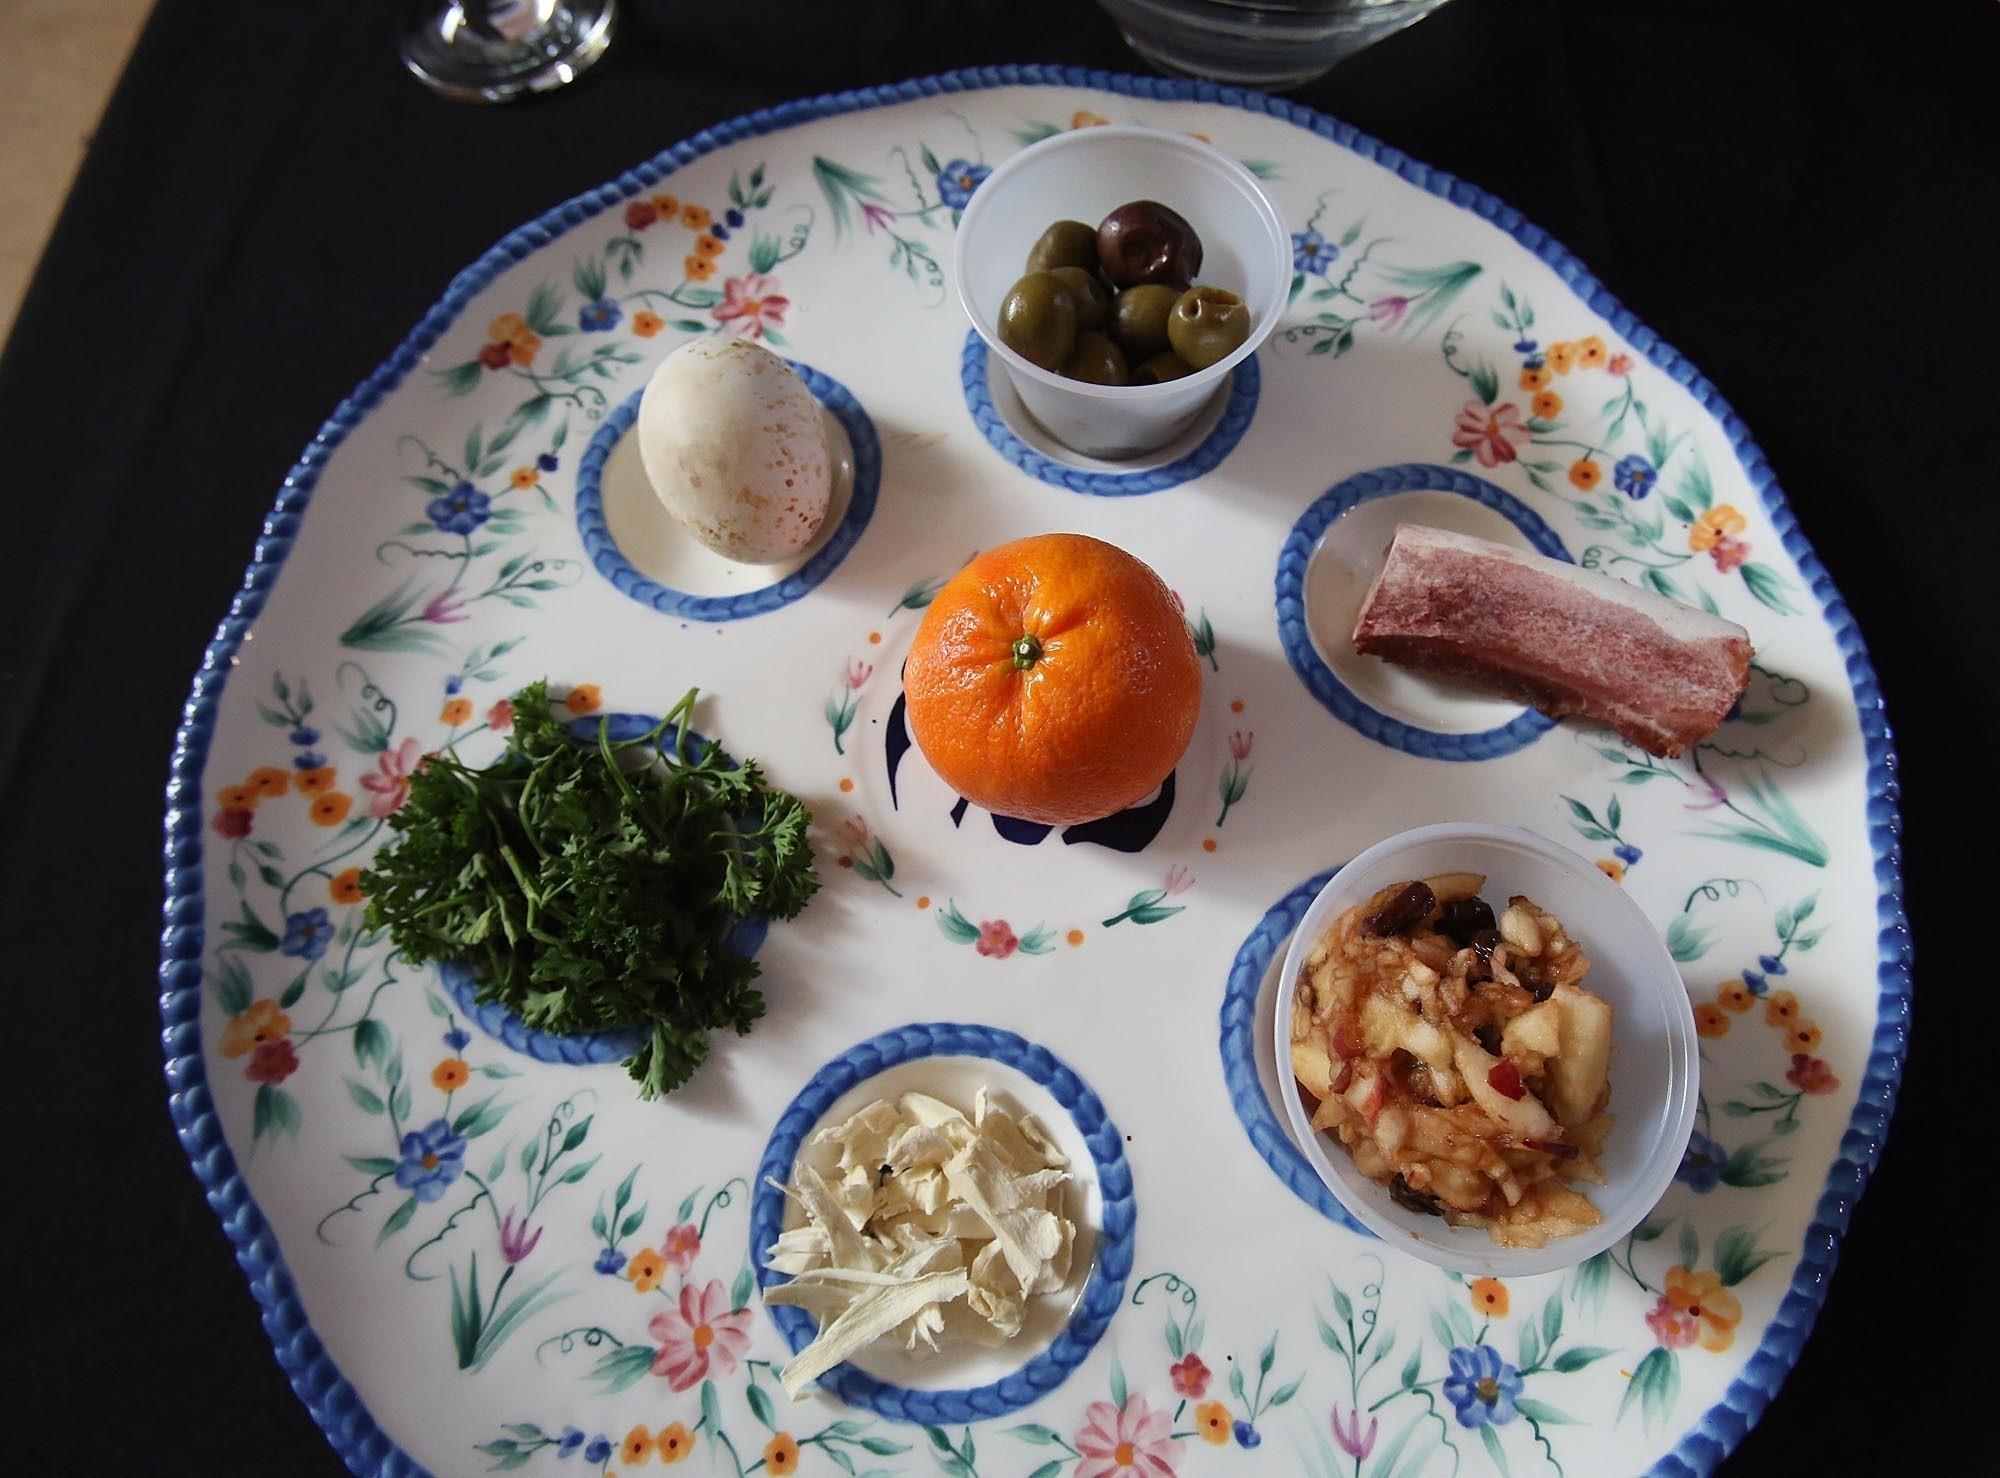 Test Kitchen bonus: Passover recipes to enhance your Seder menu